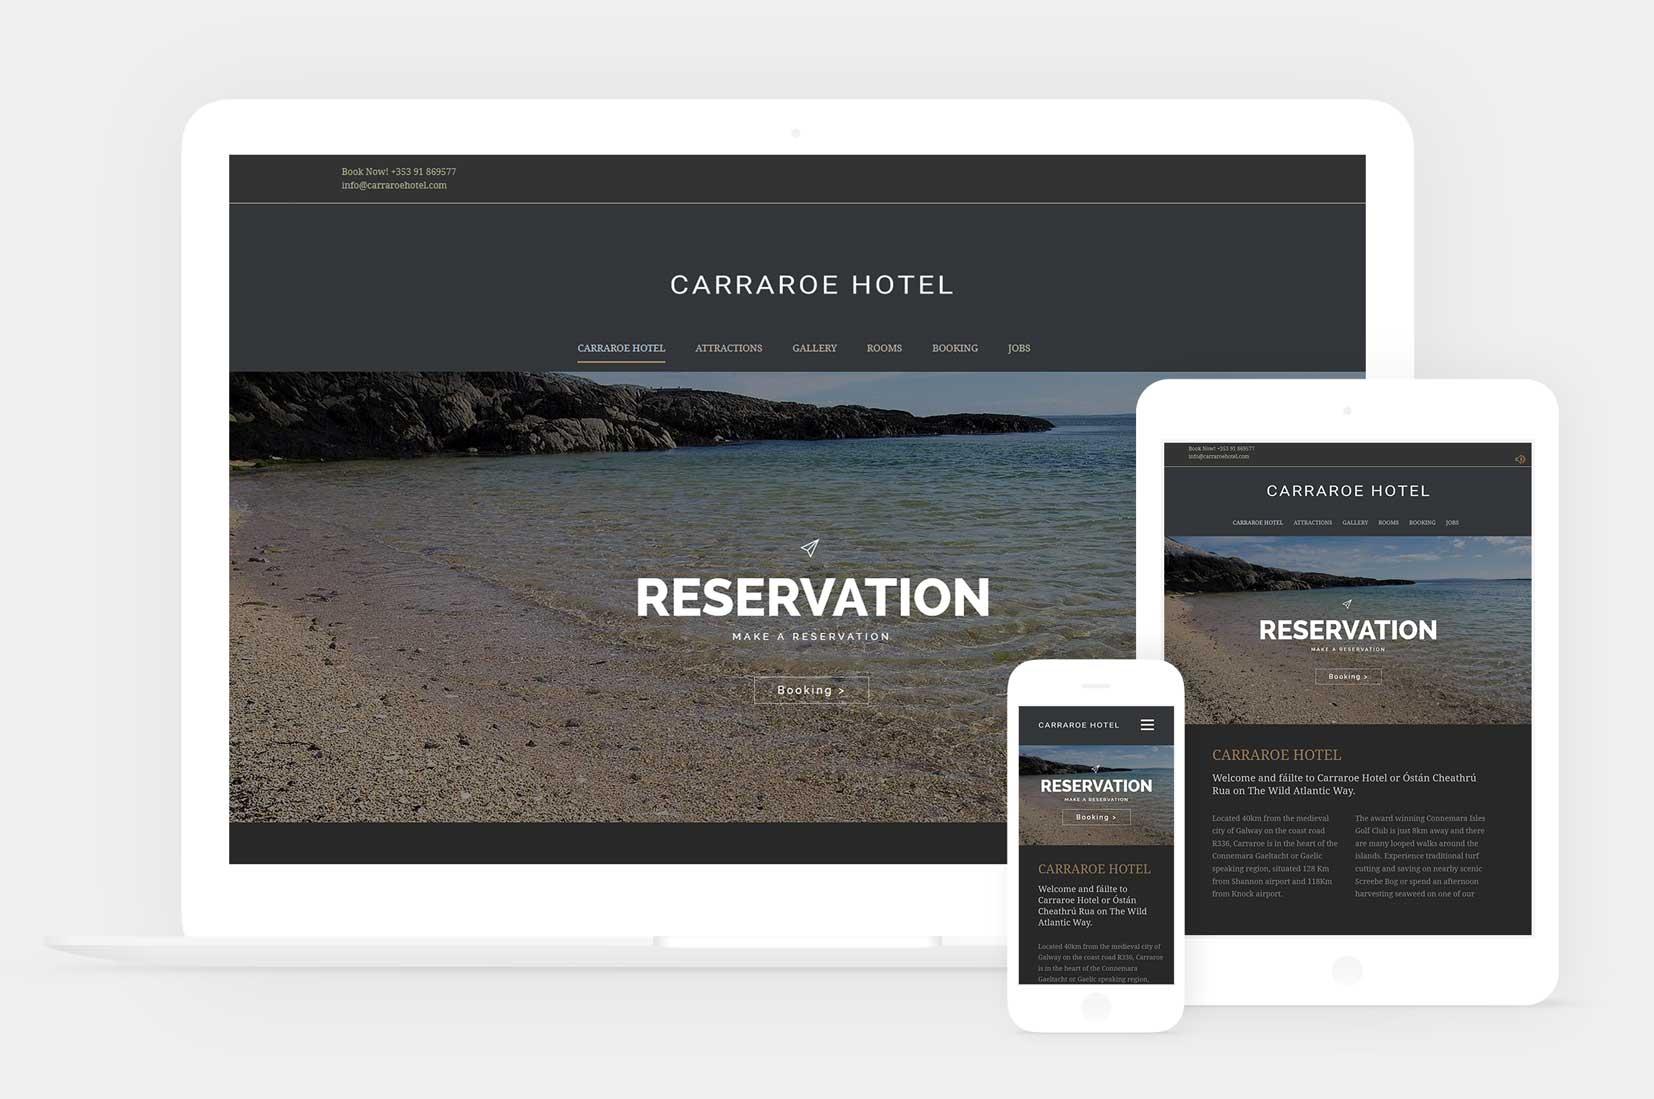 Wordpress based website design for carraroe hotel